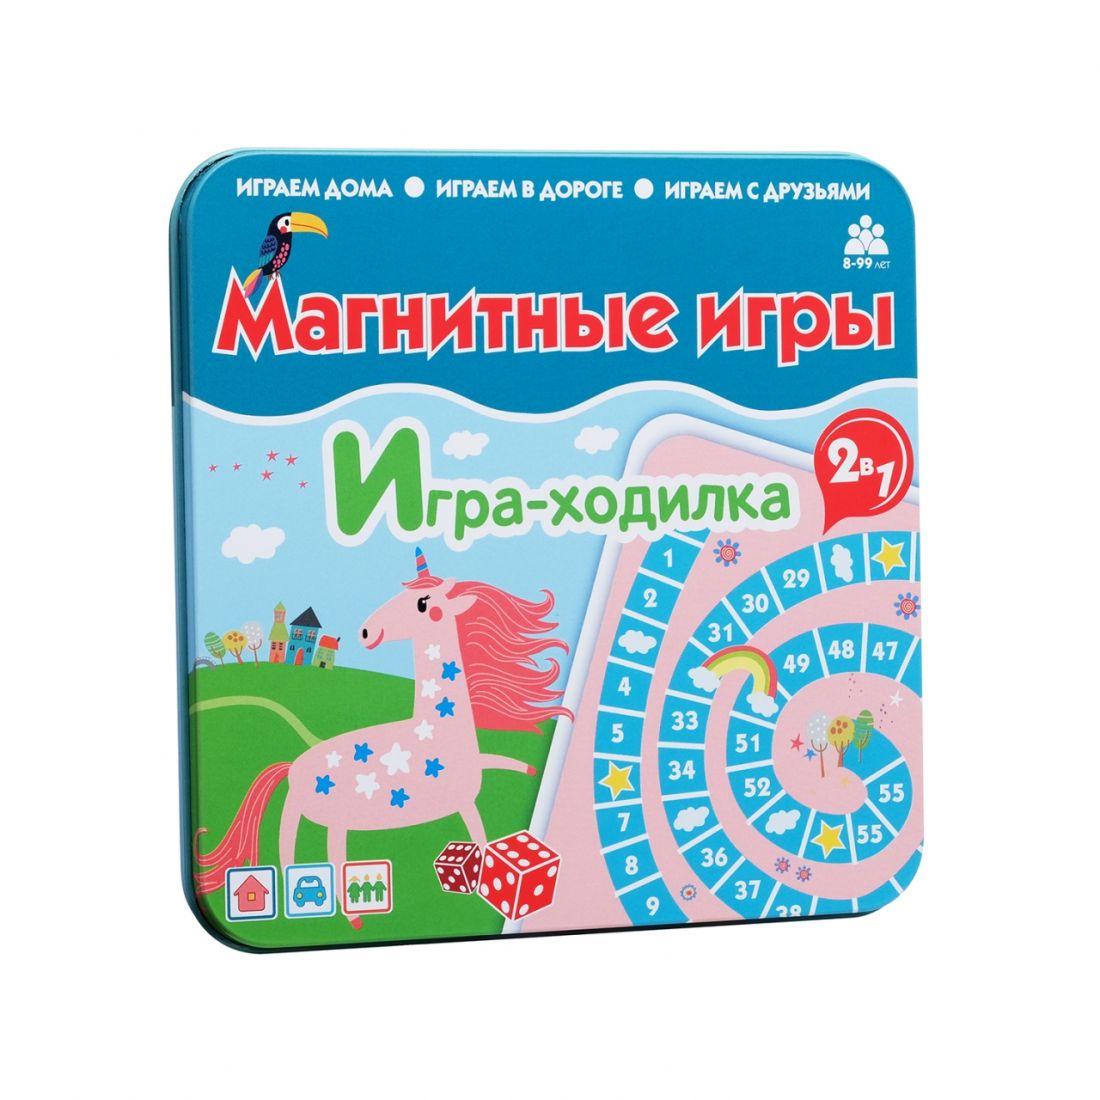 Магнитная игра БУМБАРАМ IM-1010 Ходилка Единороги